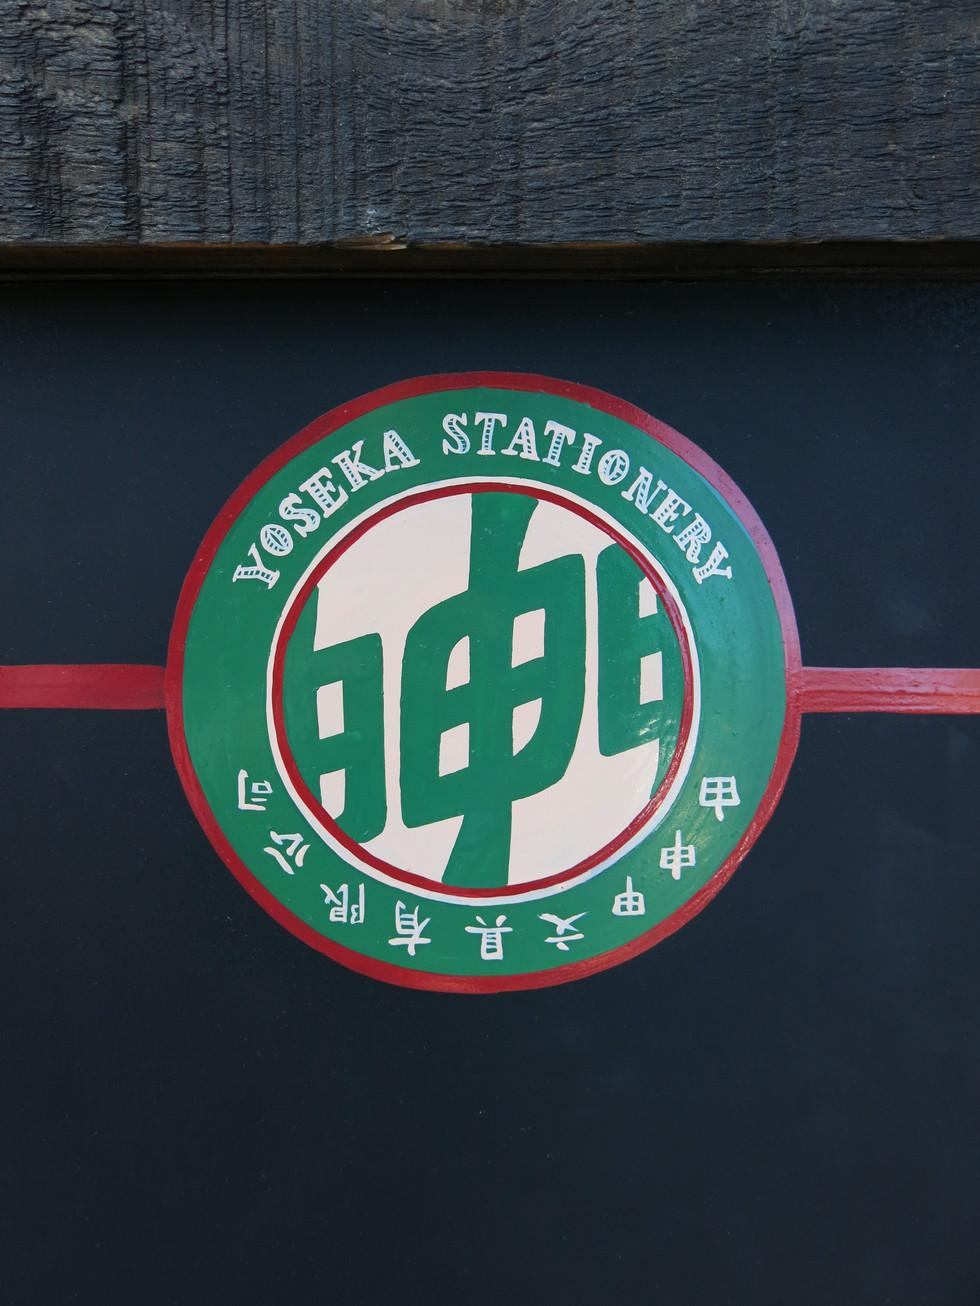 Yoseka Stationery